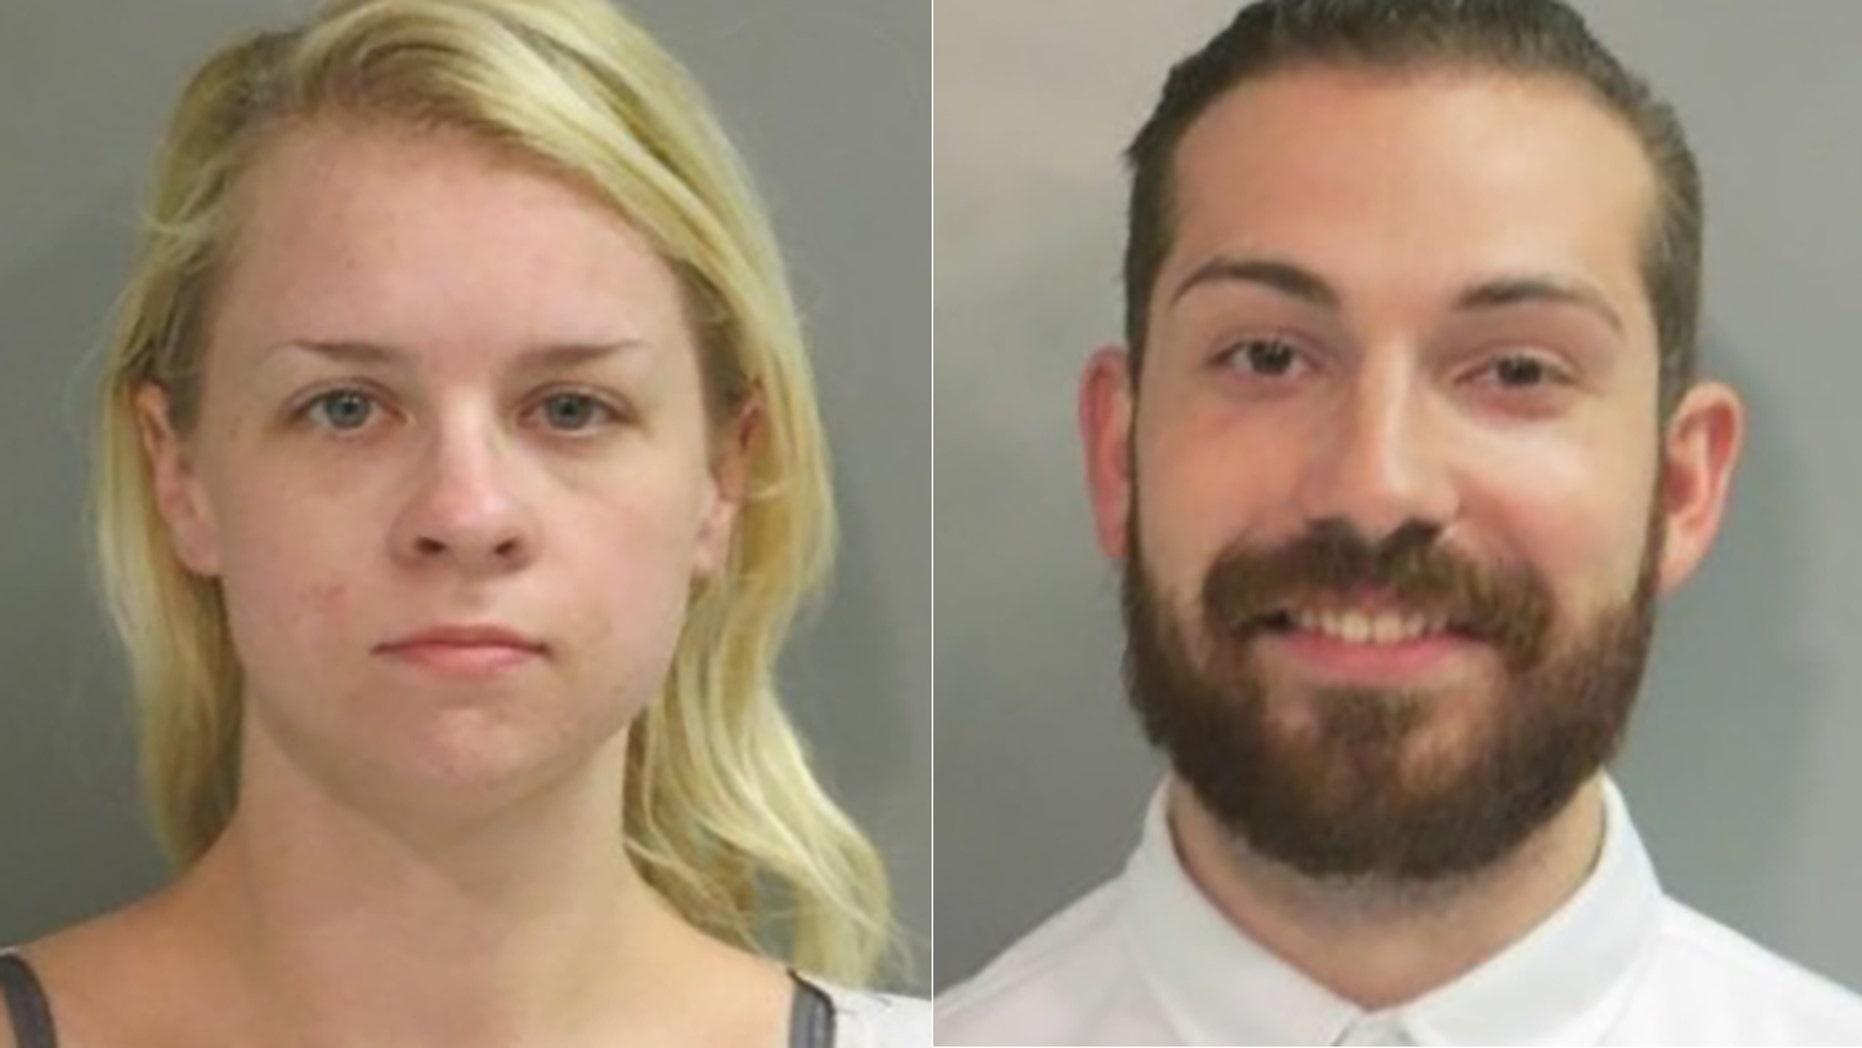 Maxine Feldstein, left, allegedly posed as a California deputy to help her boyfriend, Nicholas Lowe, escape from jail.